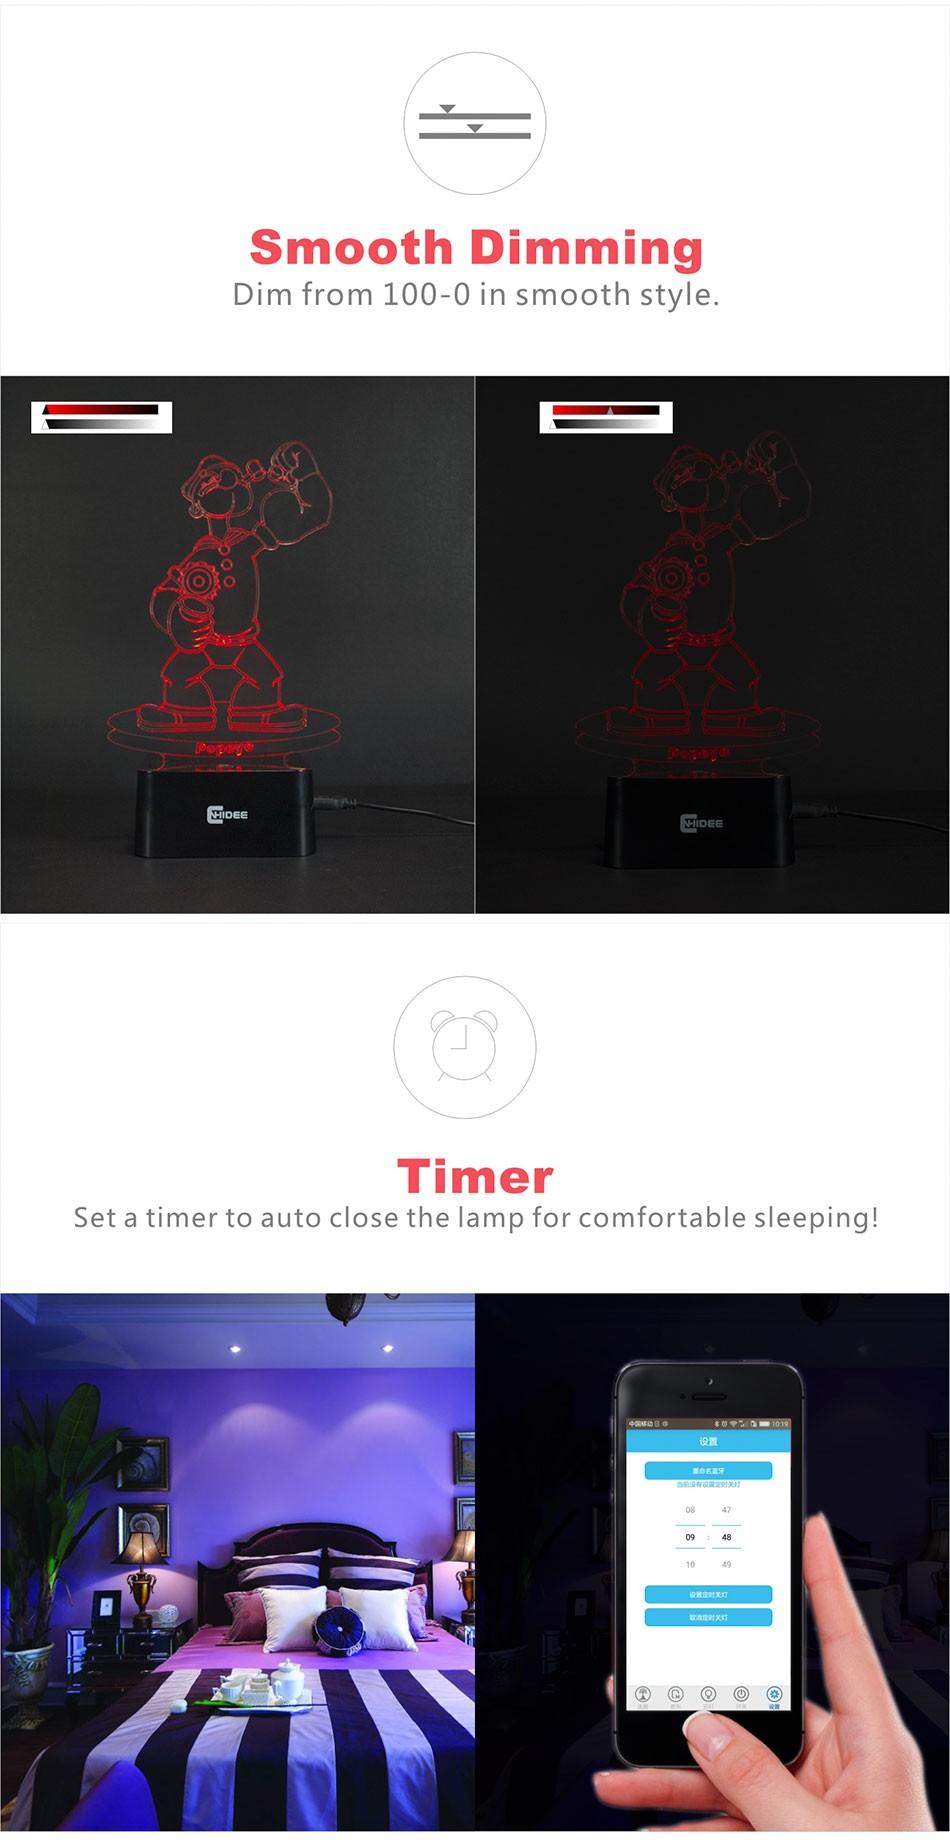 CNHIDEE Lampada Decorativa USB Desk 3D Night Lamp Bluetooth Music Led Table Lamp as Creative Gifts for Cartoon Popeye Fans (6)